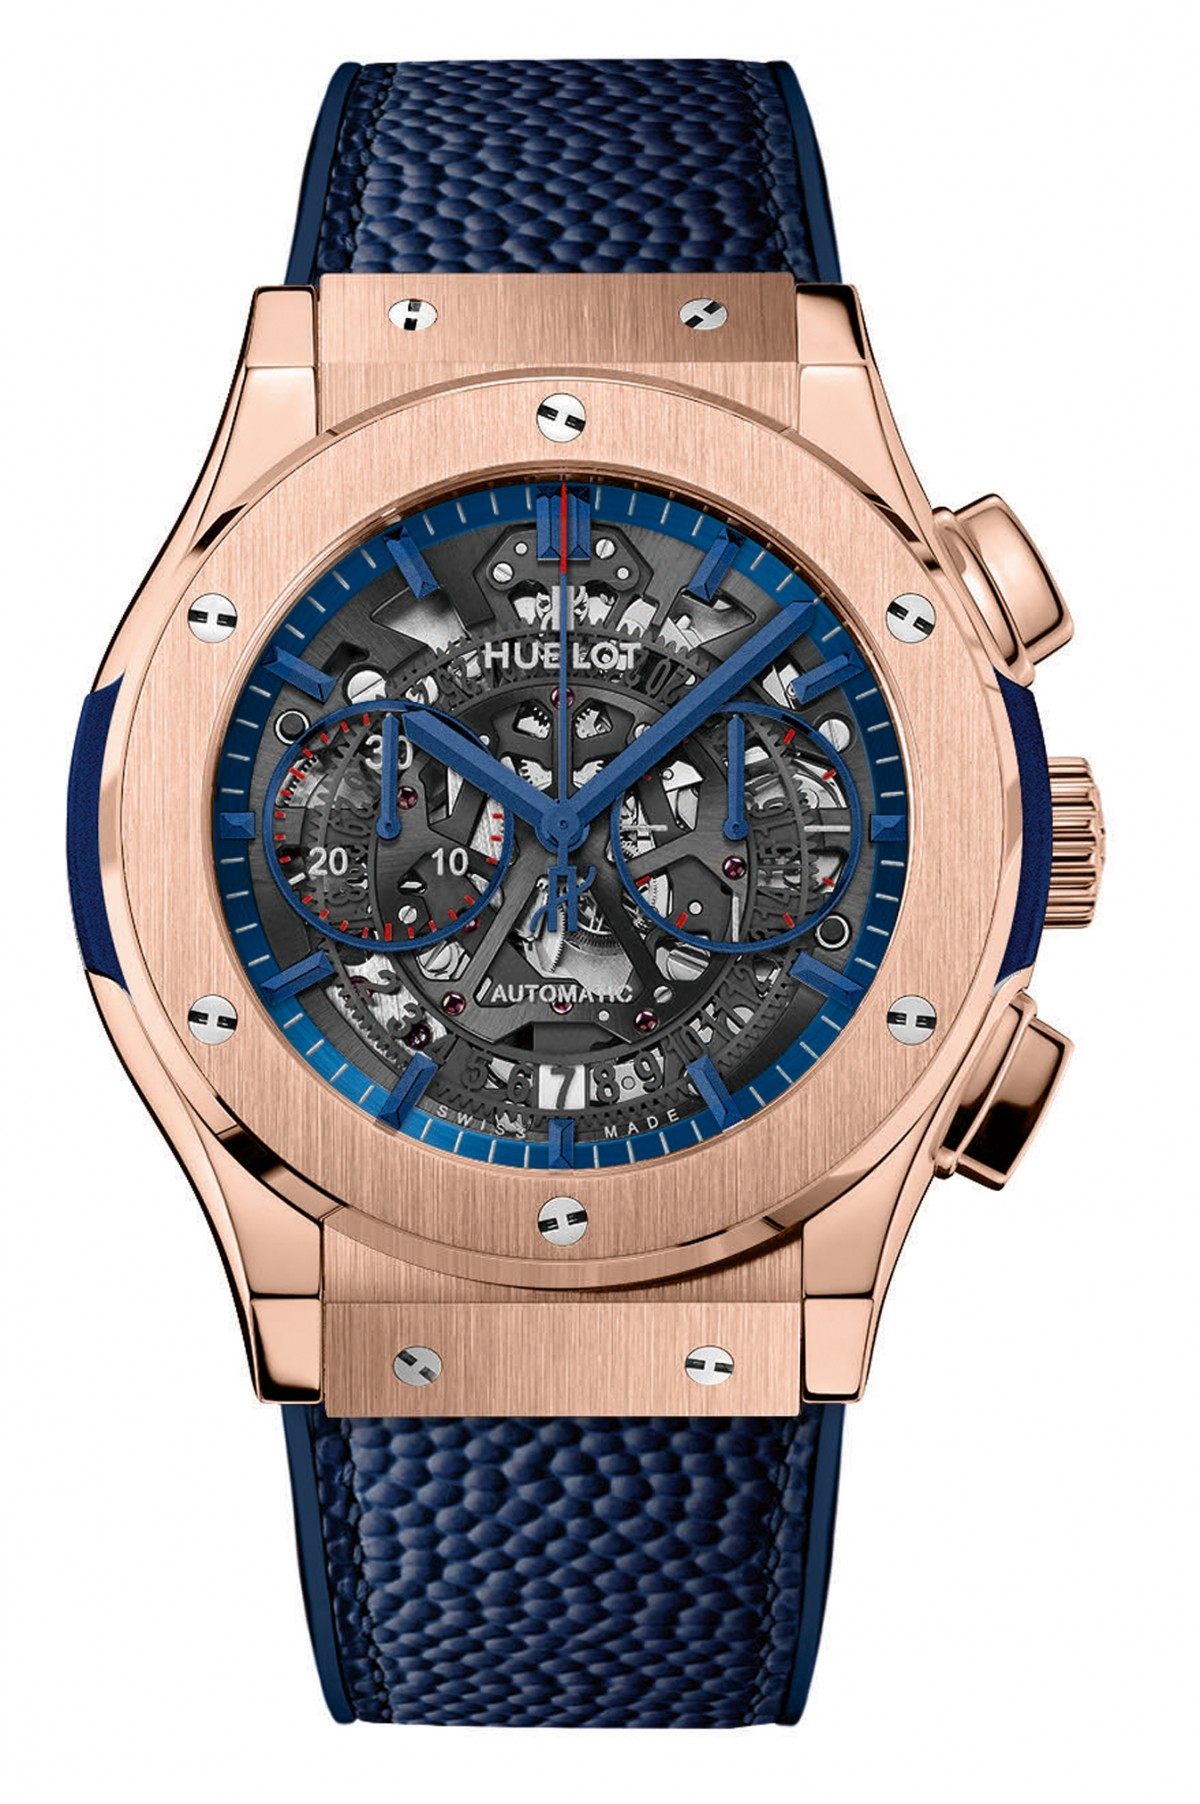 classic-fusion-aerofusion-limited-new-york-edition-watch-hublot-new-york-giants